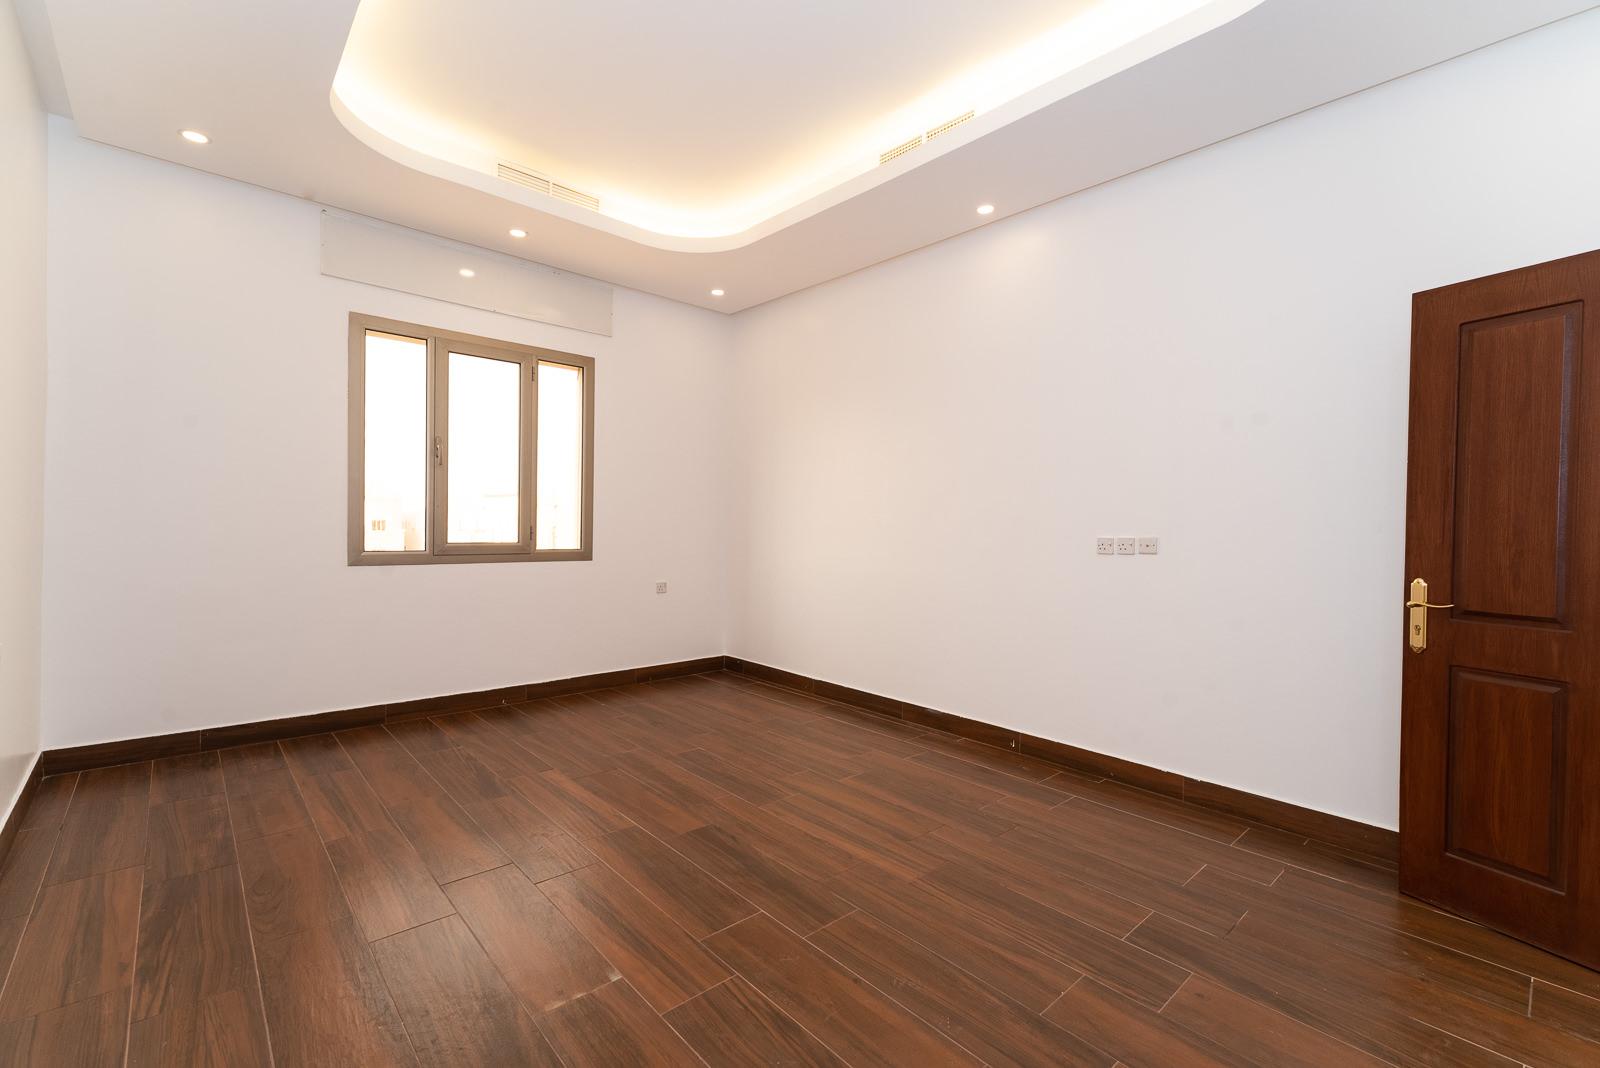 Abu Fatira – great, spacious, three bedroom apartment